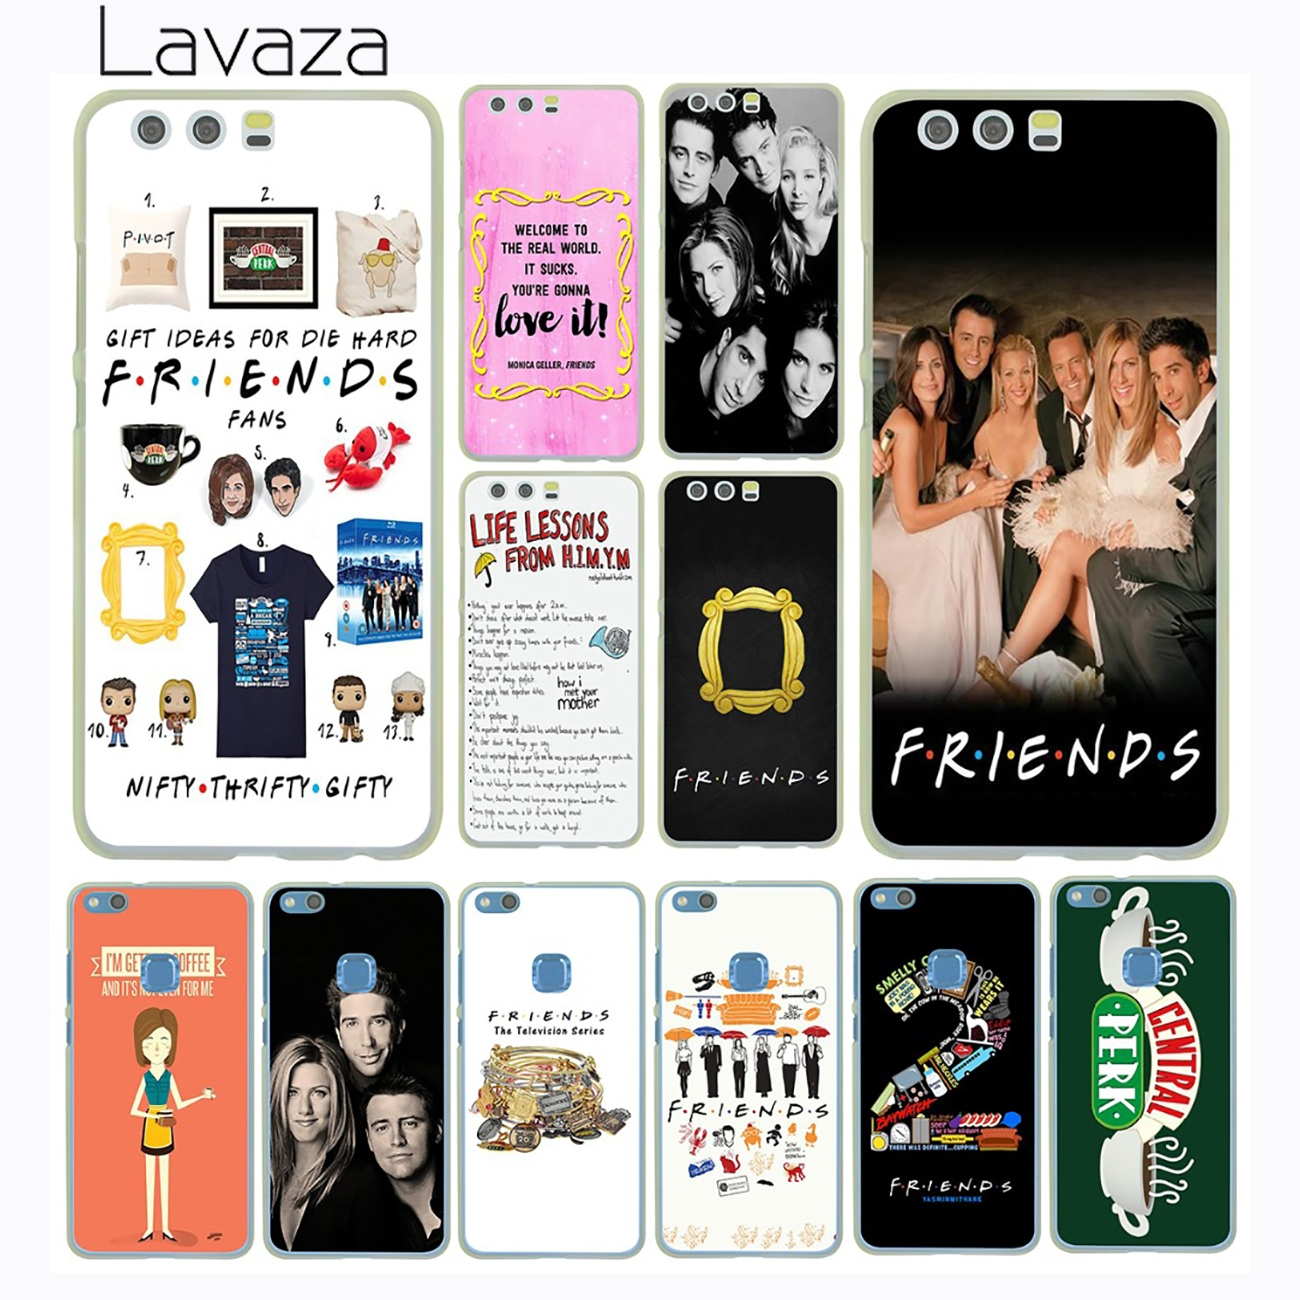 Lavaza <font><b>TV</b></font> Series Hot <font><b>Show</b></font> <font><b>Friends</b></font> <font><b>Phone</b></font> Poster Hard <font><b>Case</b></font> Cover for Huawei P8 P9 P10 Lite Plus G7 &#038; Honor 8 Lite 6 7 4C 4X